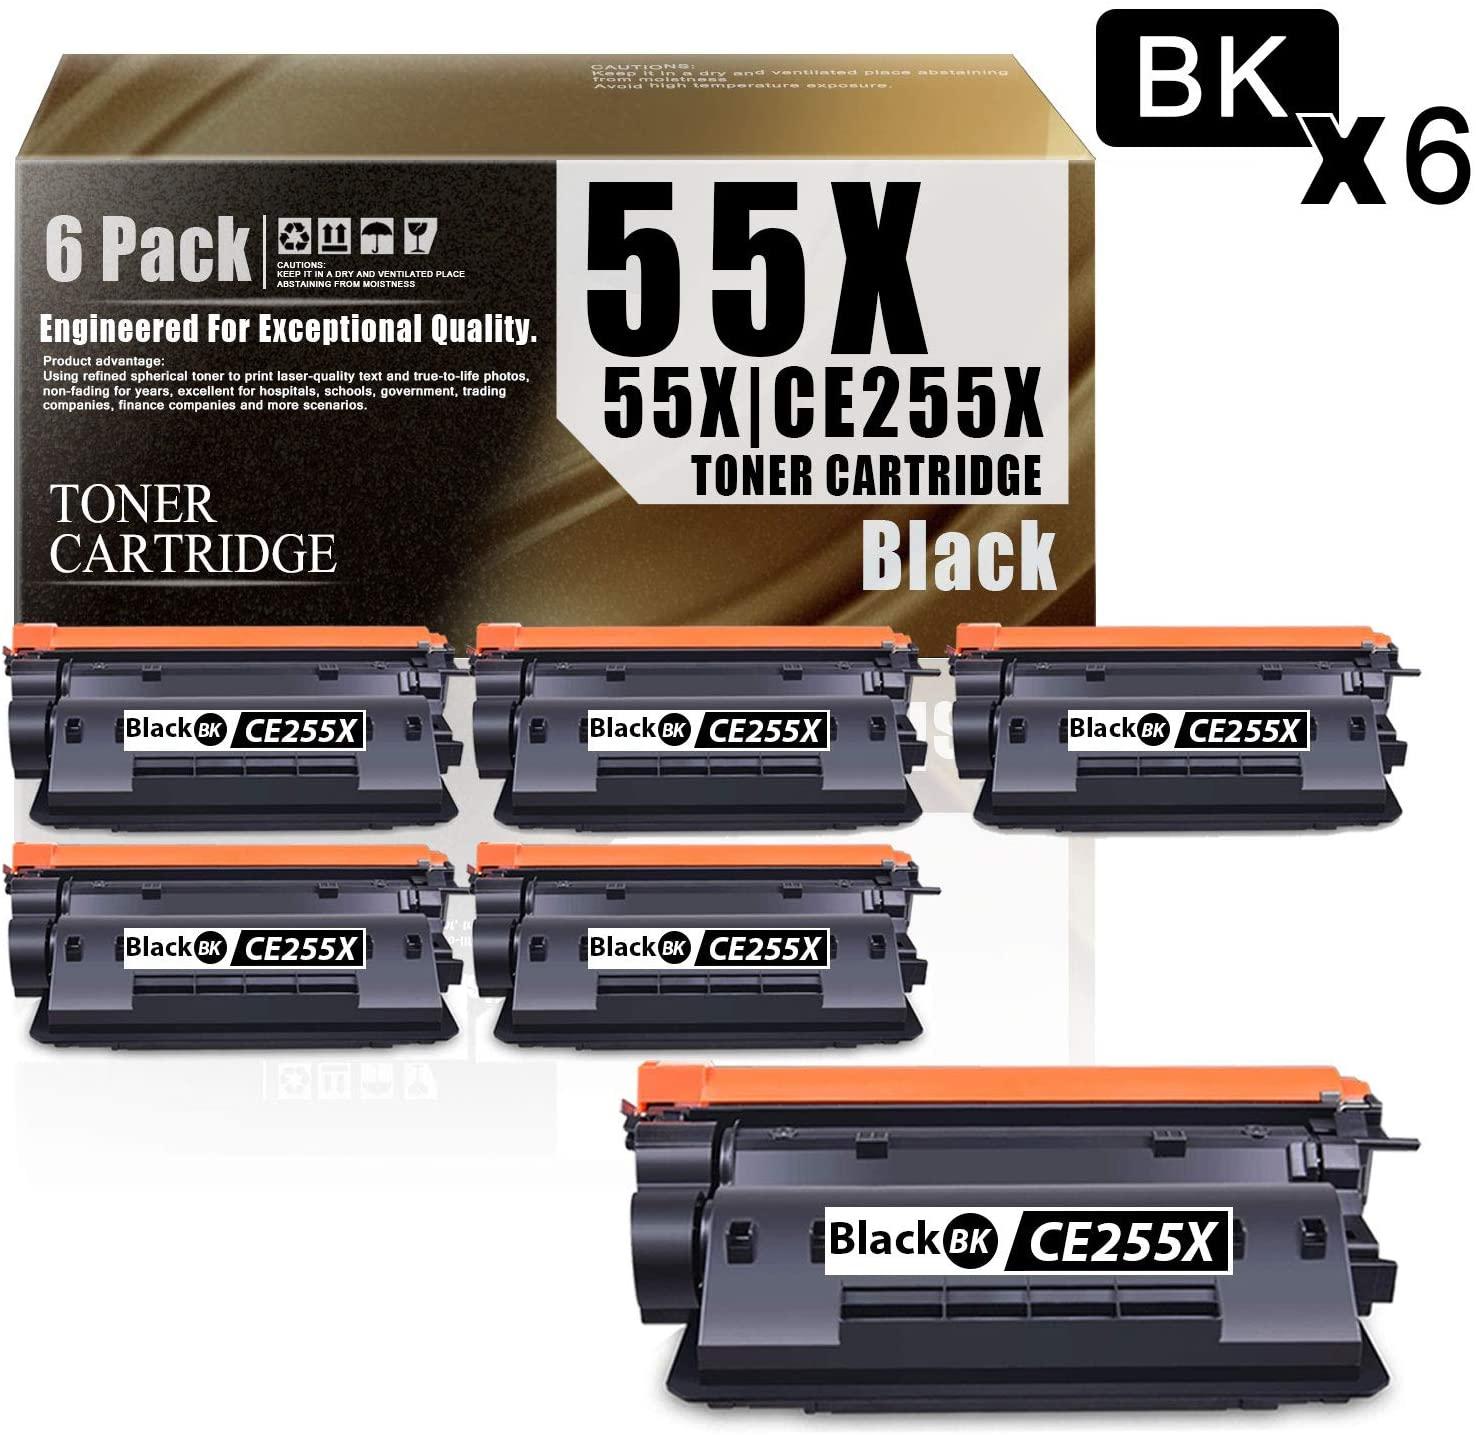 55X   CE255X(6-Pack Black) Compatible Ink Cartridge Replacement for HP Laserjet Pro MFP M521dn Pro MFP M521dw P3015d P3015n P3015dn P3015x Printers Toner Cartridge.